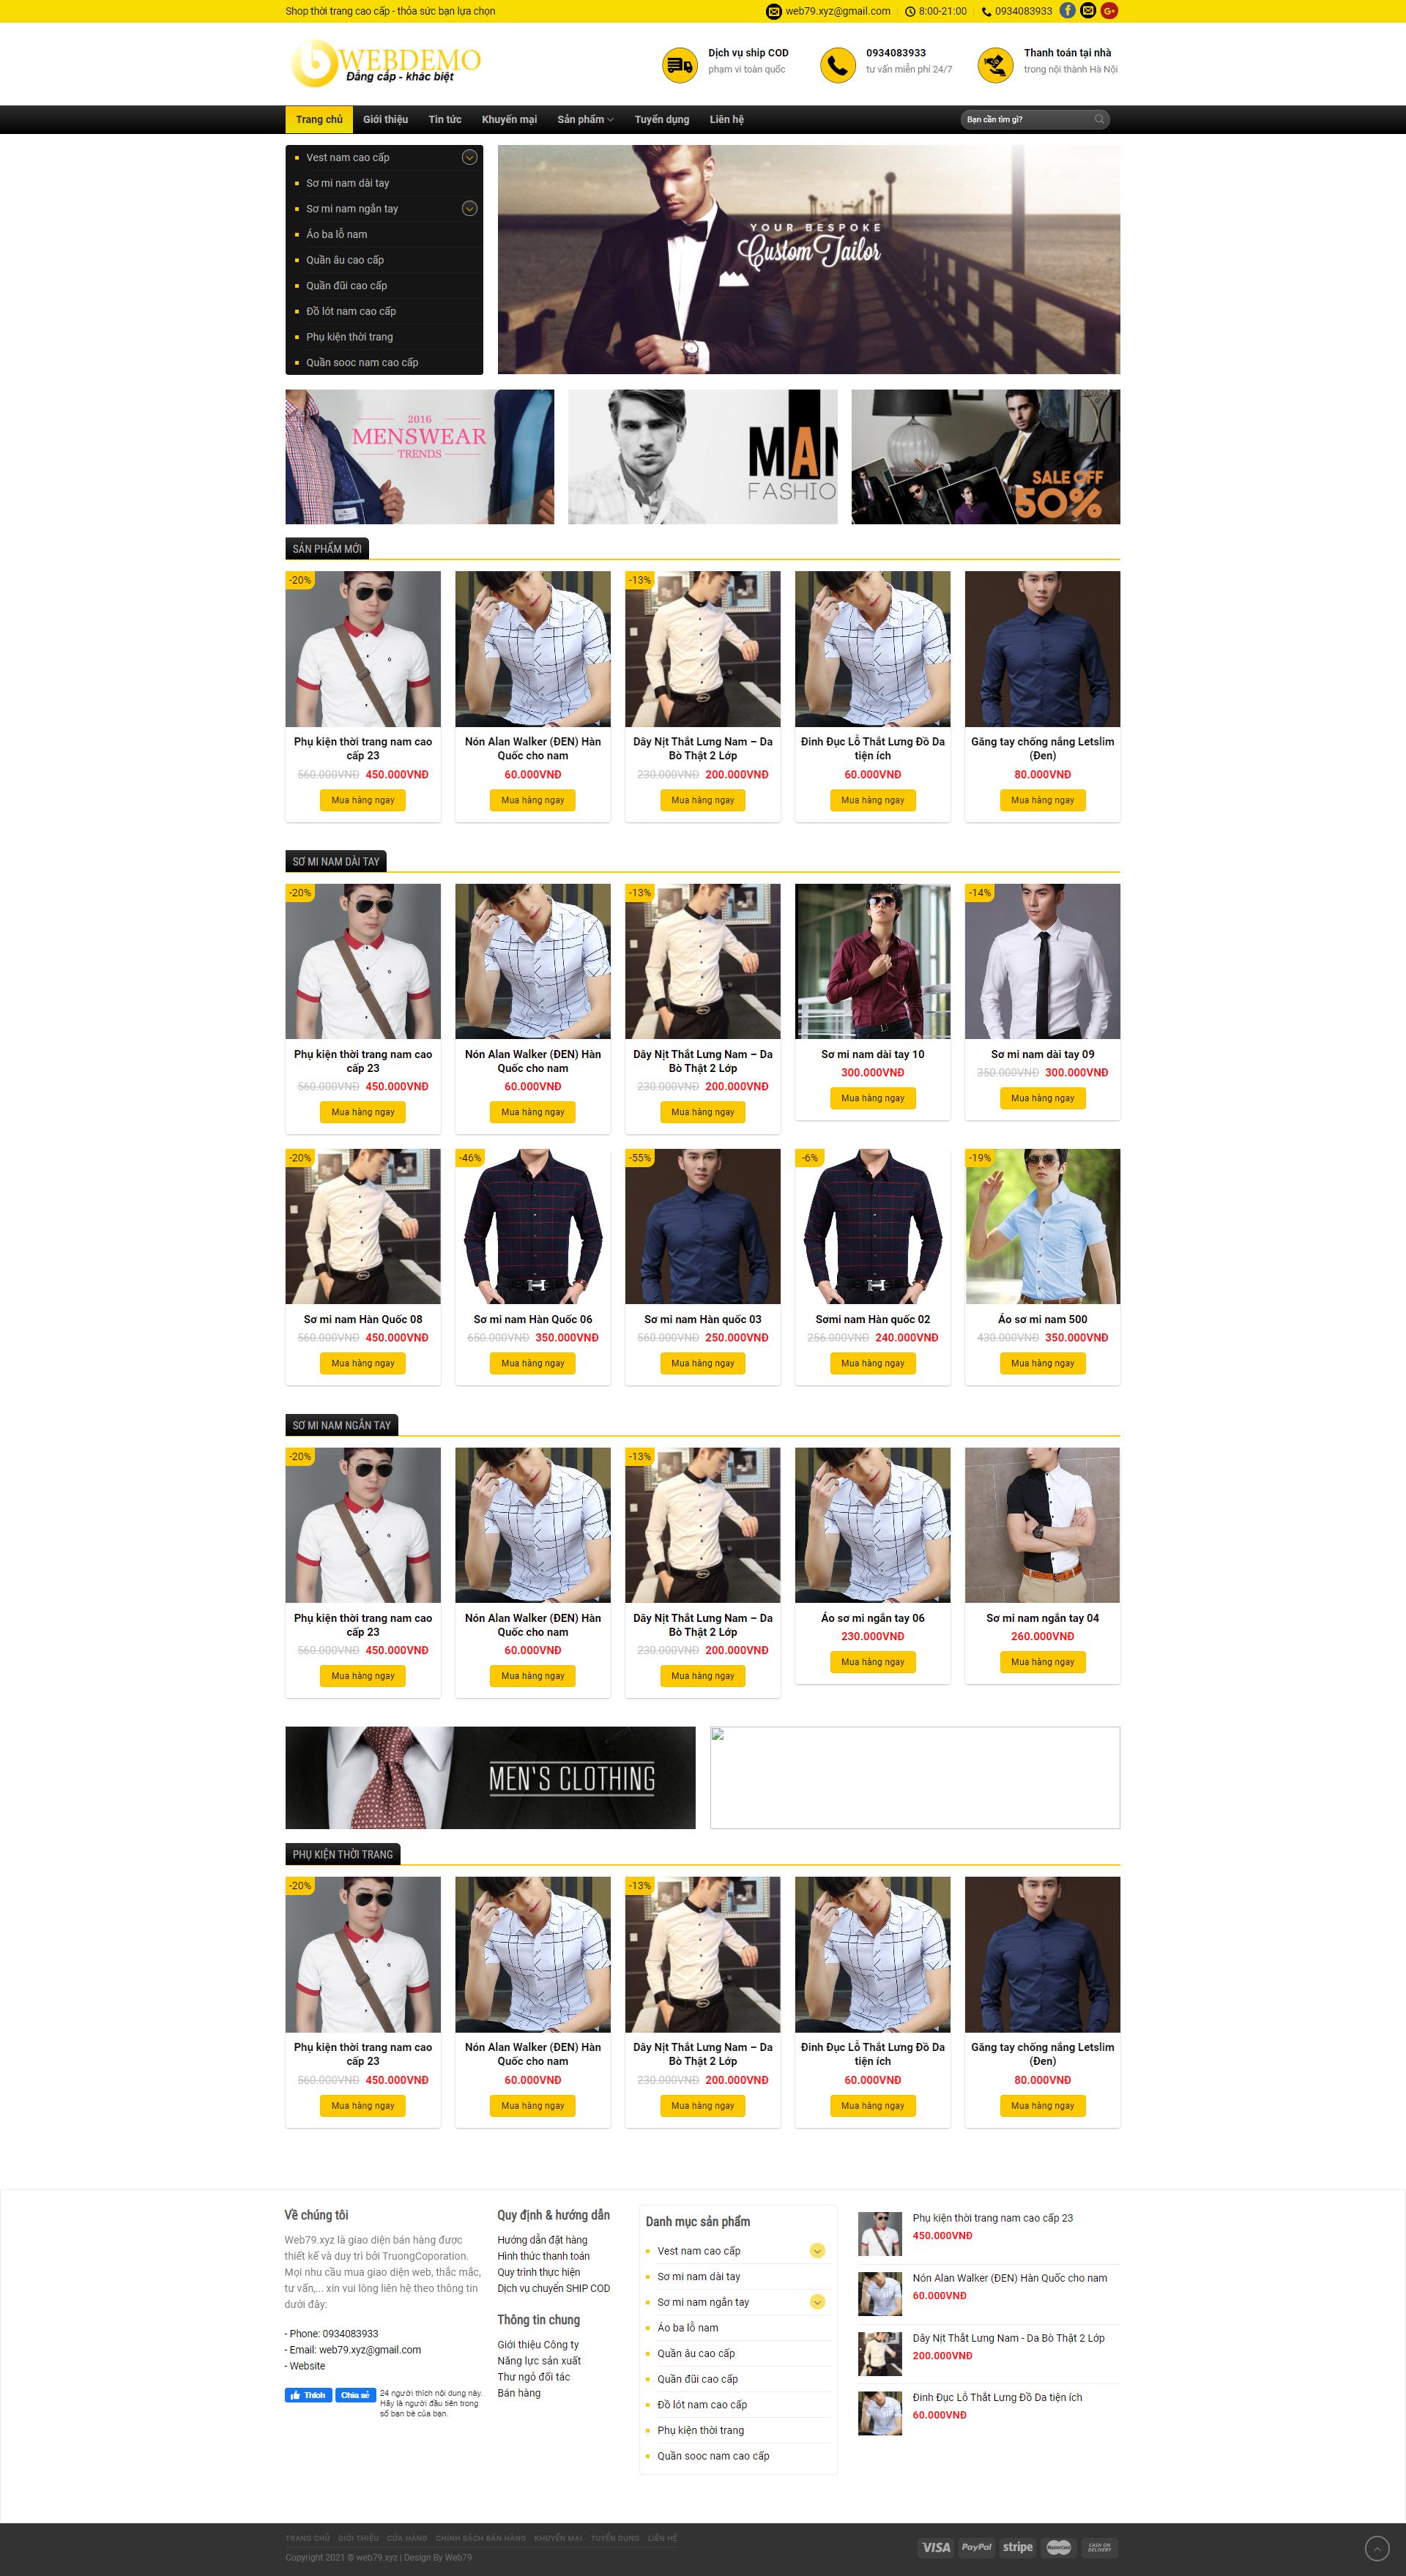 Web fashion 2